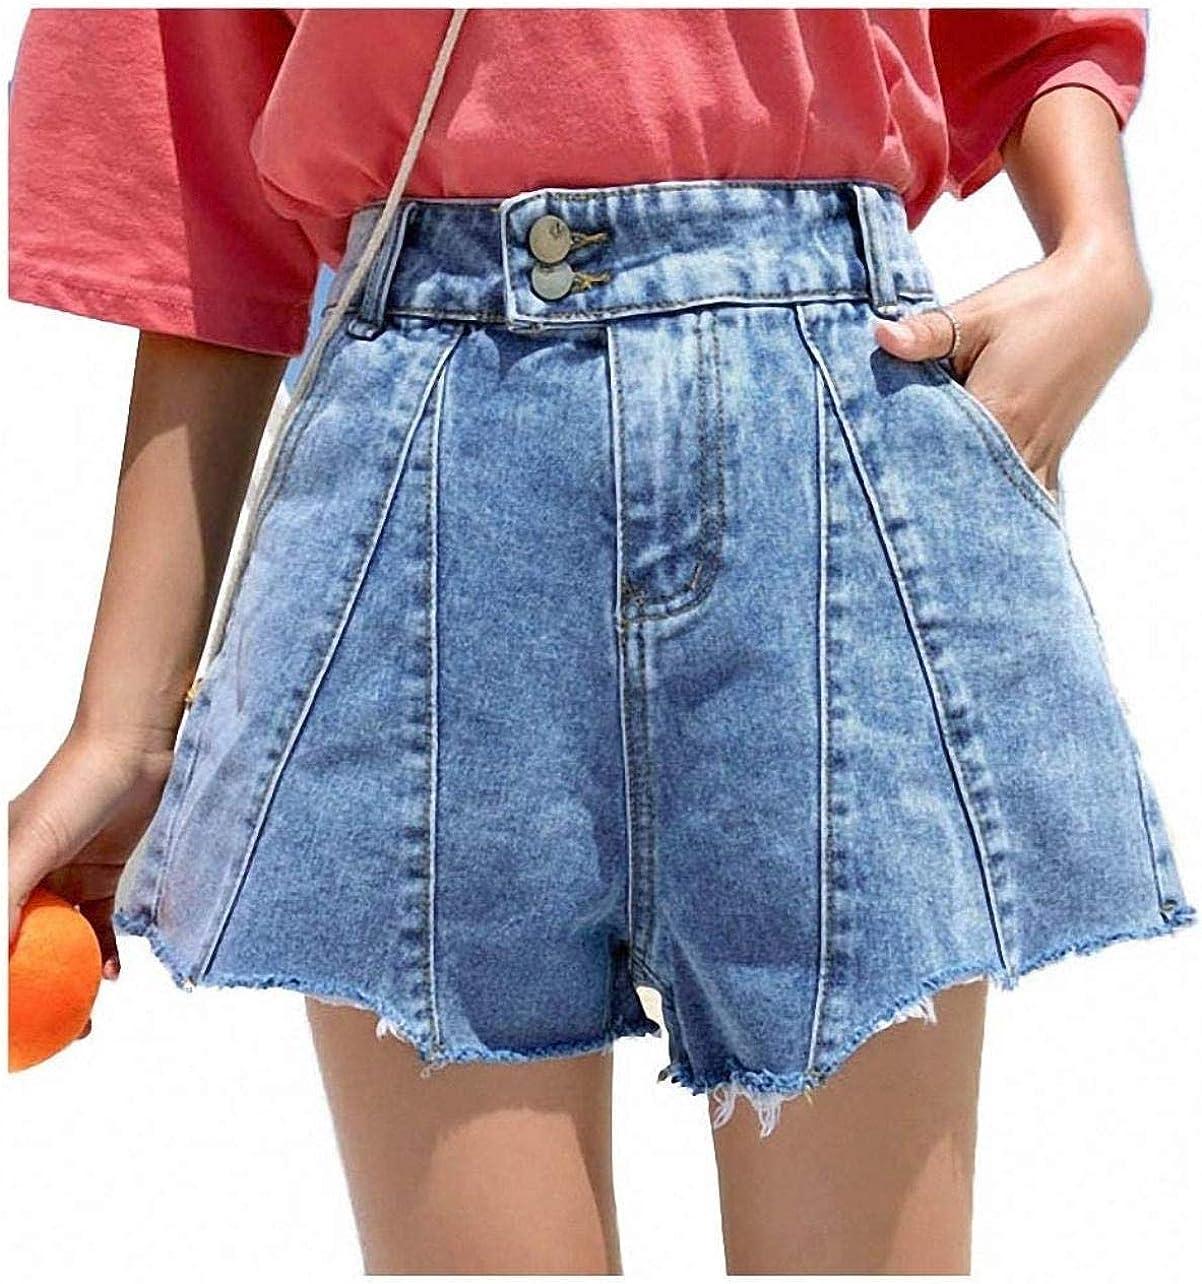 Tayaho Women Summer Plus Size High Waist Loose Denim Shorts Jeans